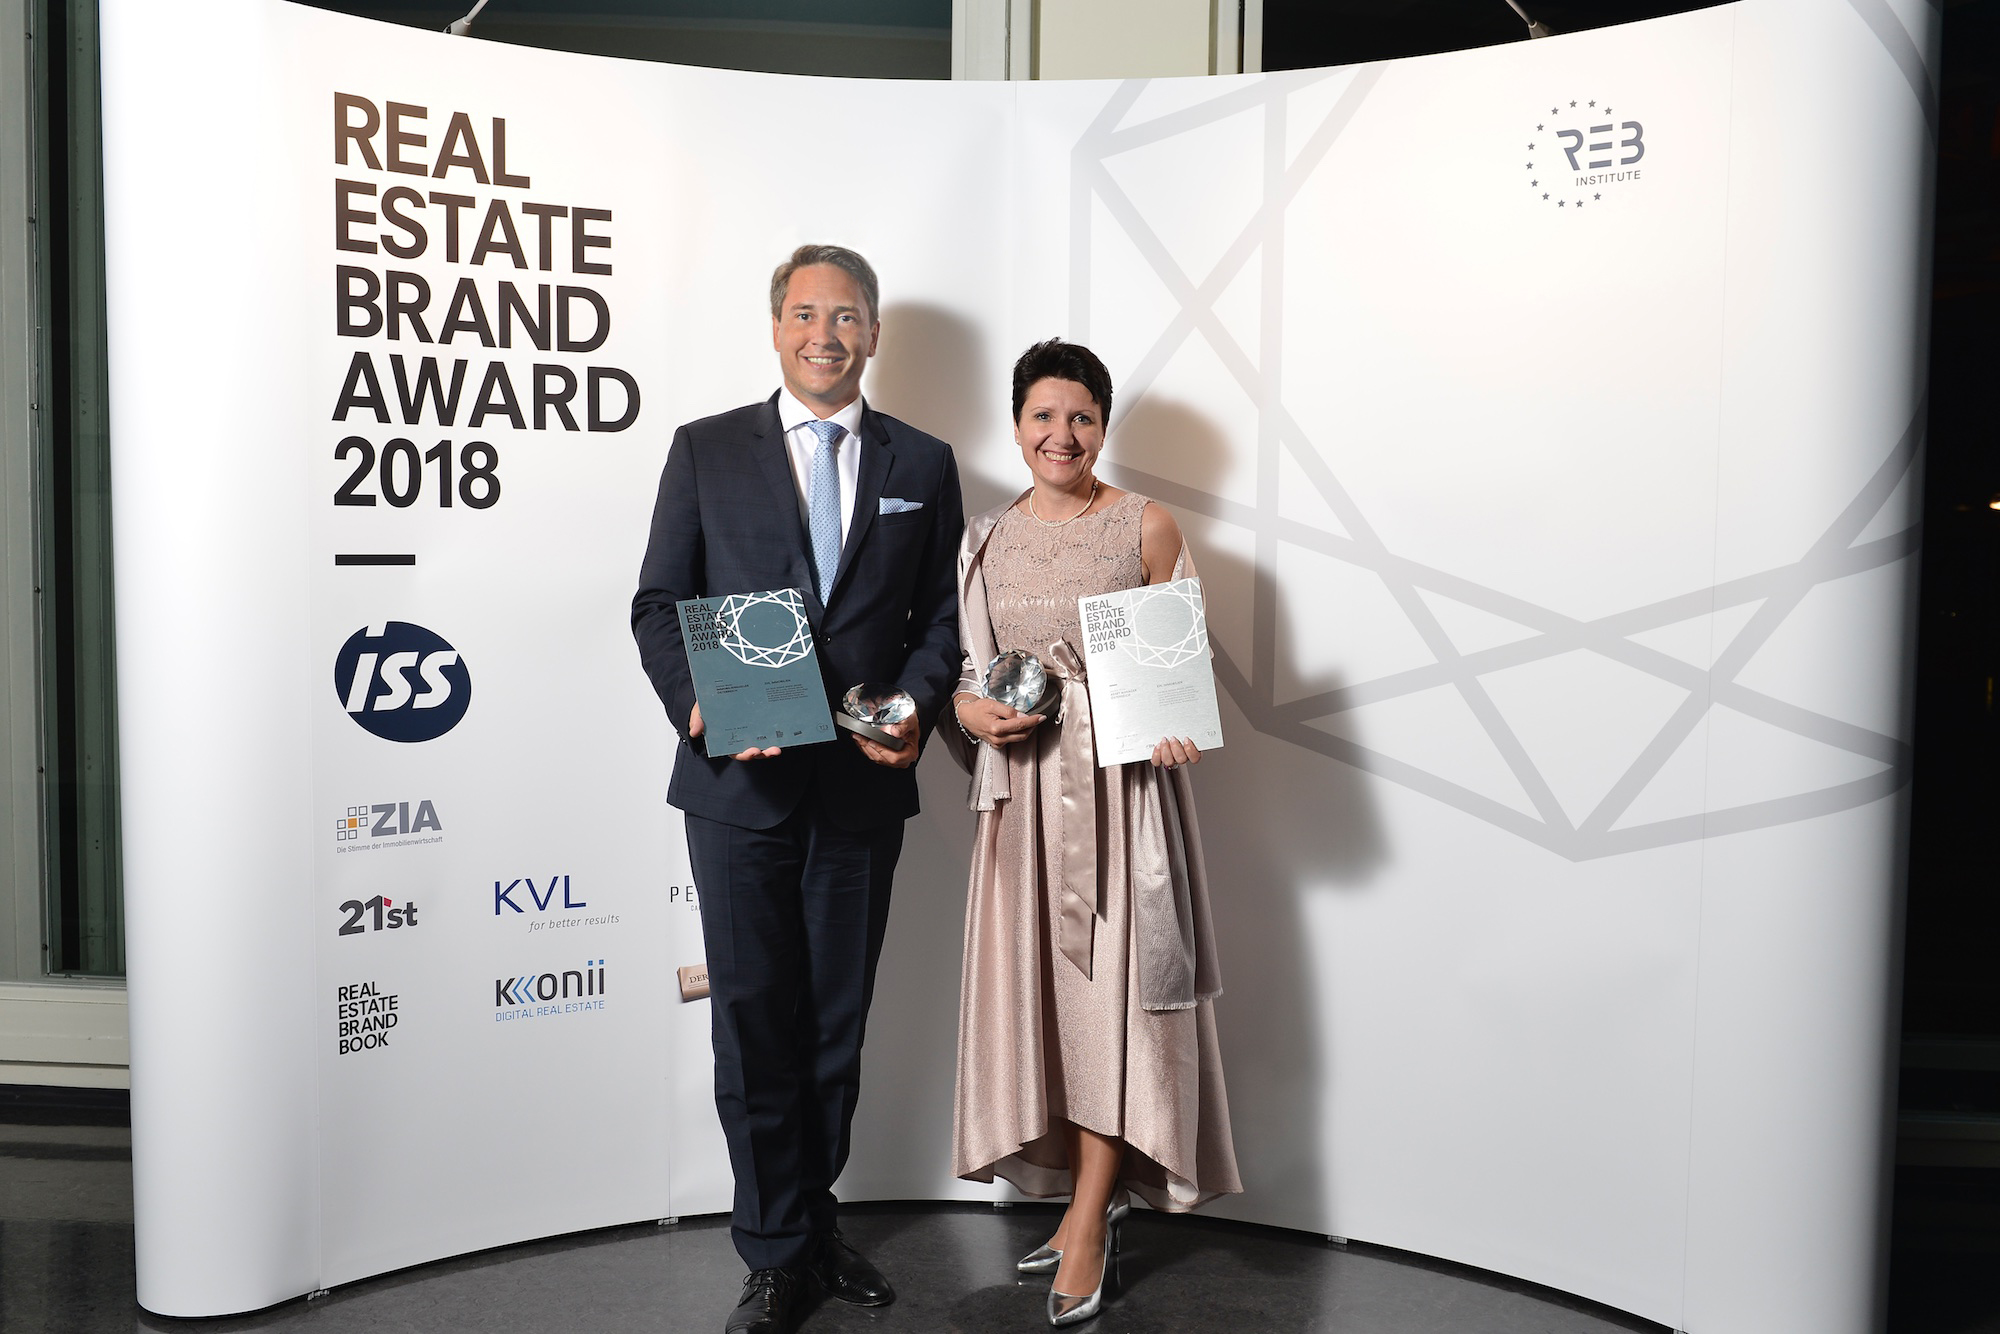 EHL: Real Estate Brand Award